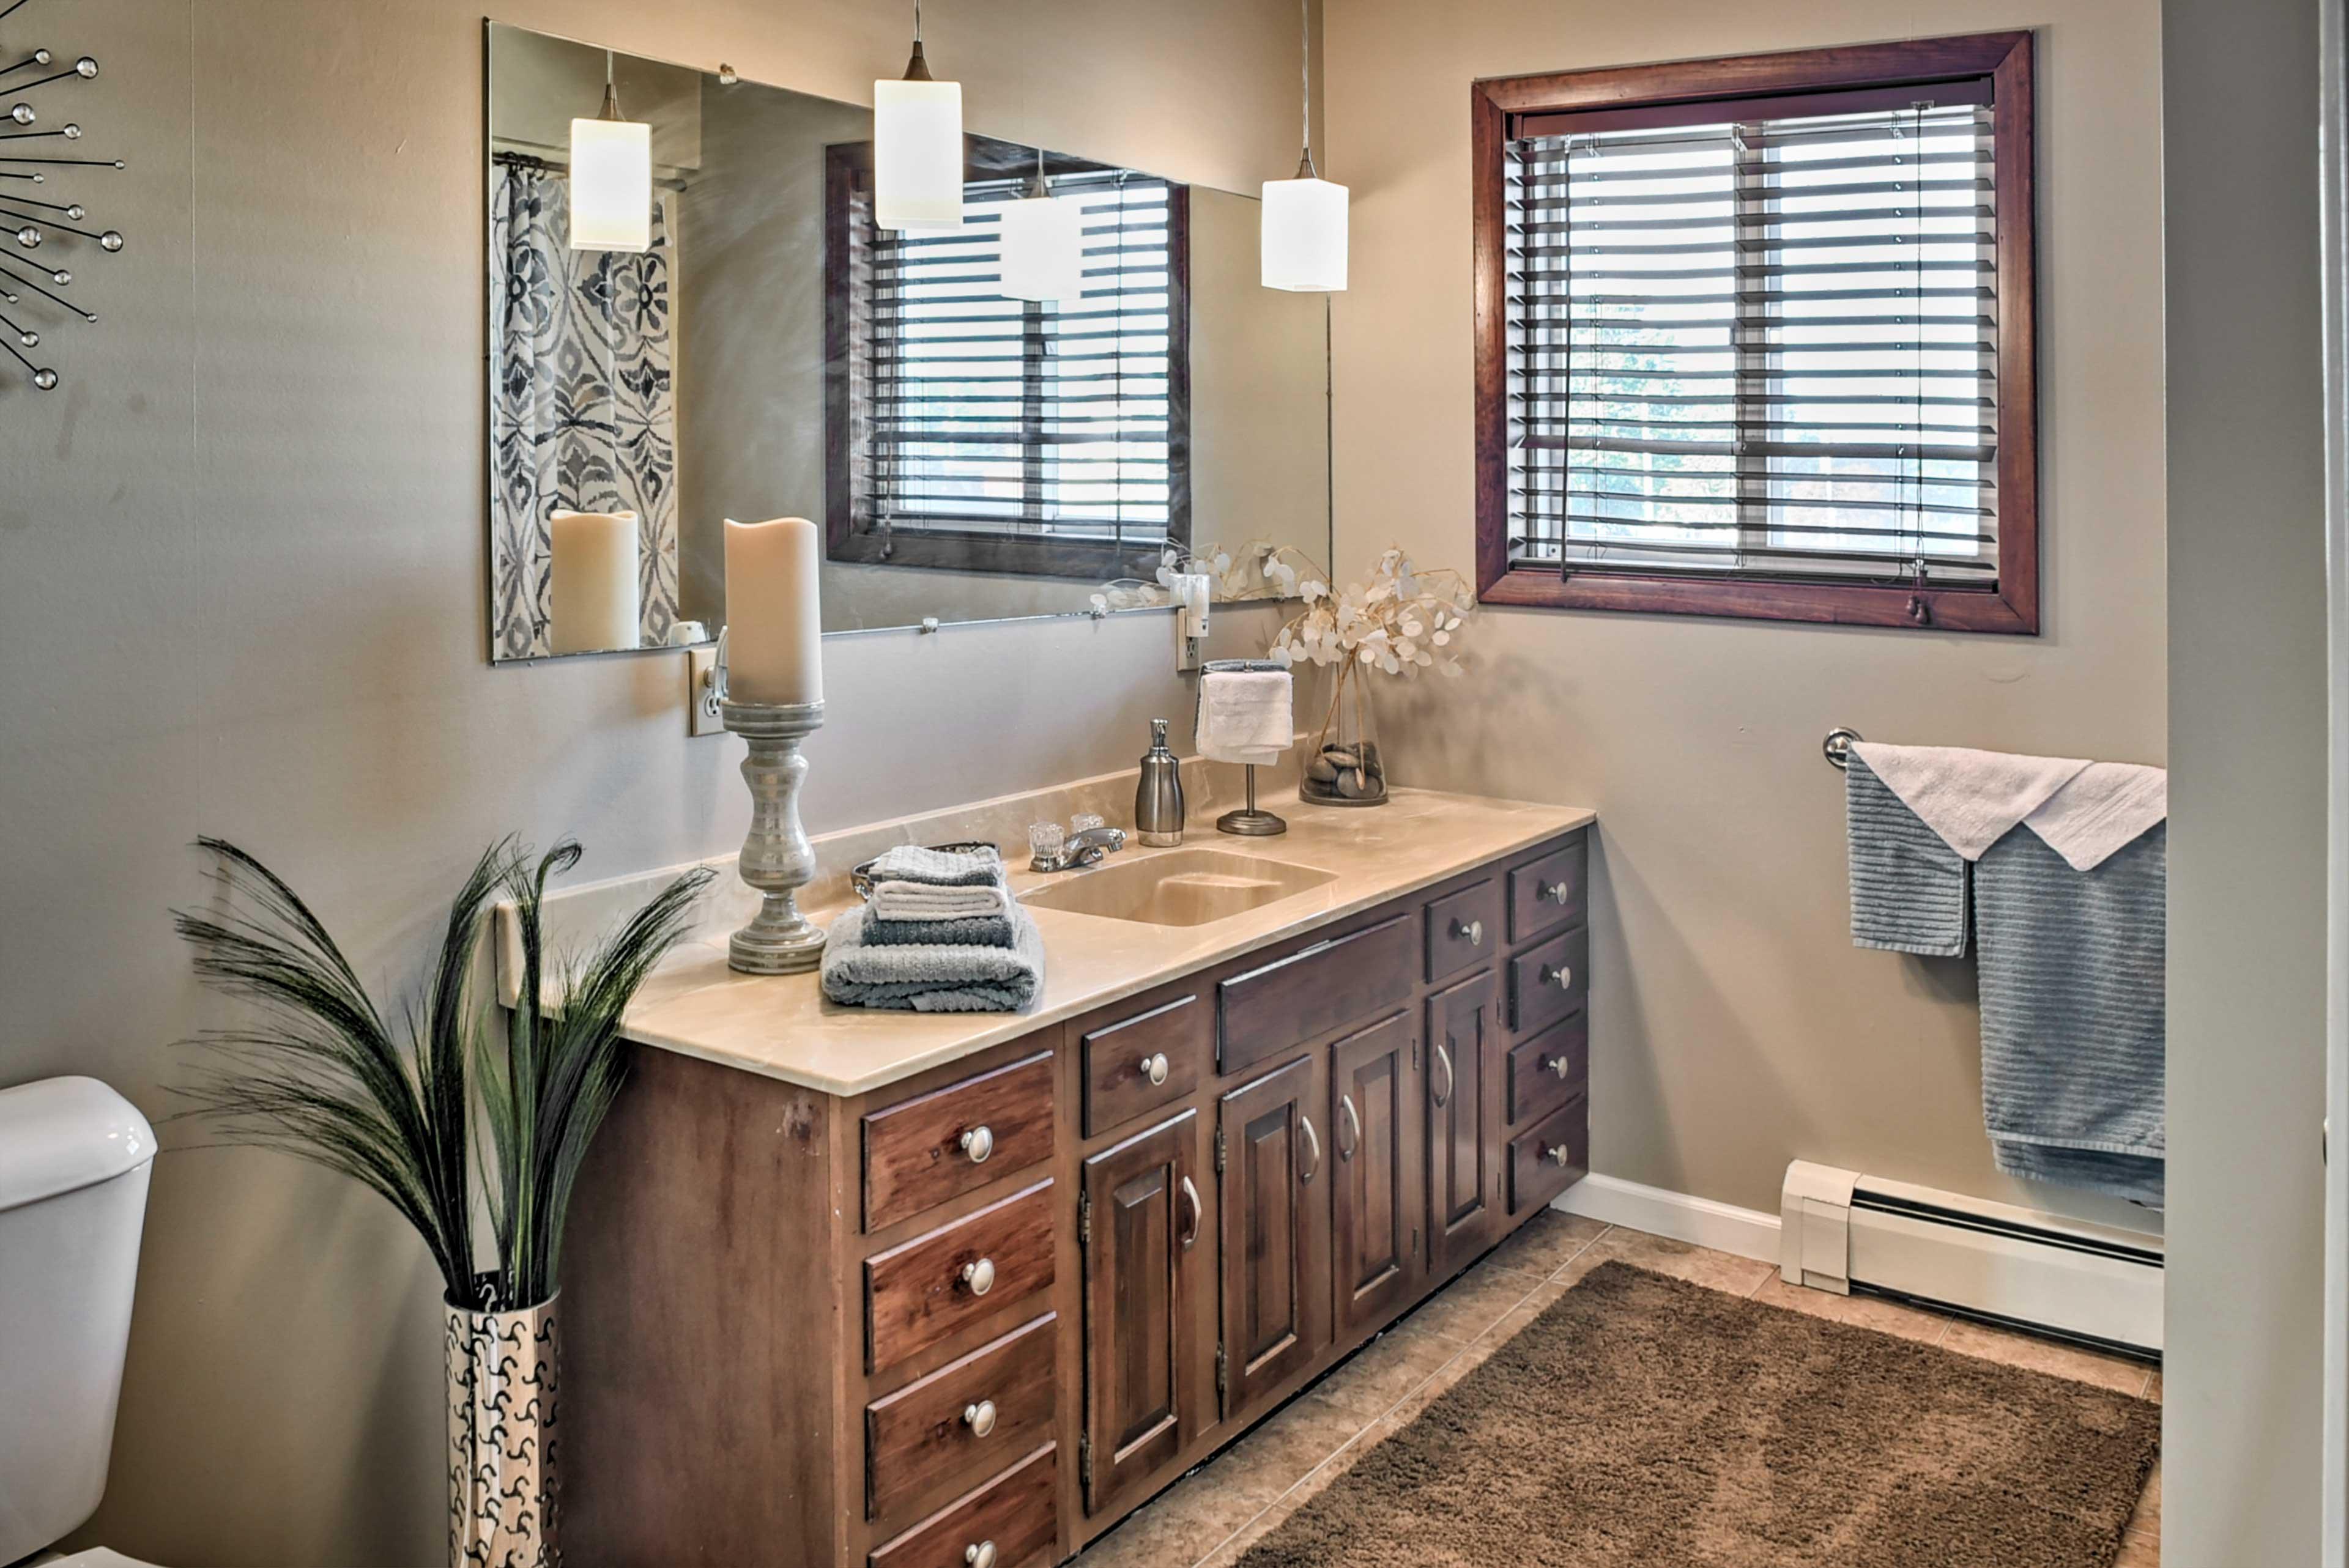 Full Bathroom | Towels Provided | Shower/Tub Combo